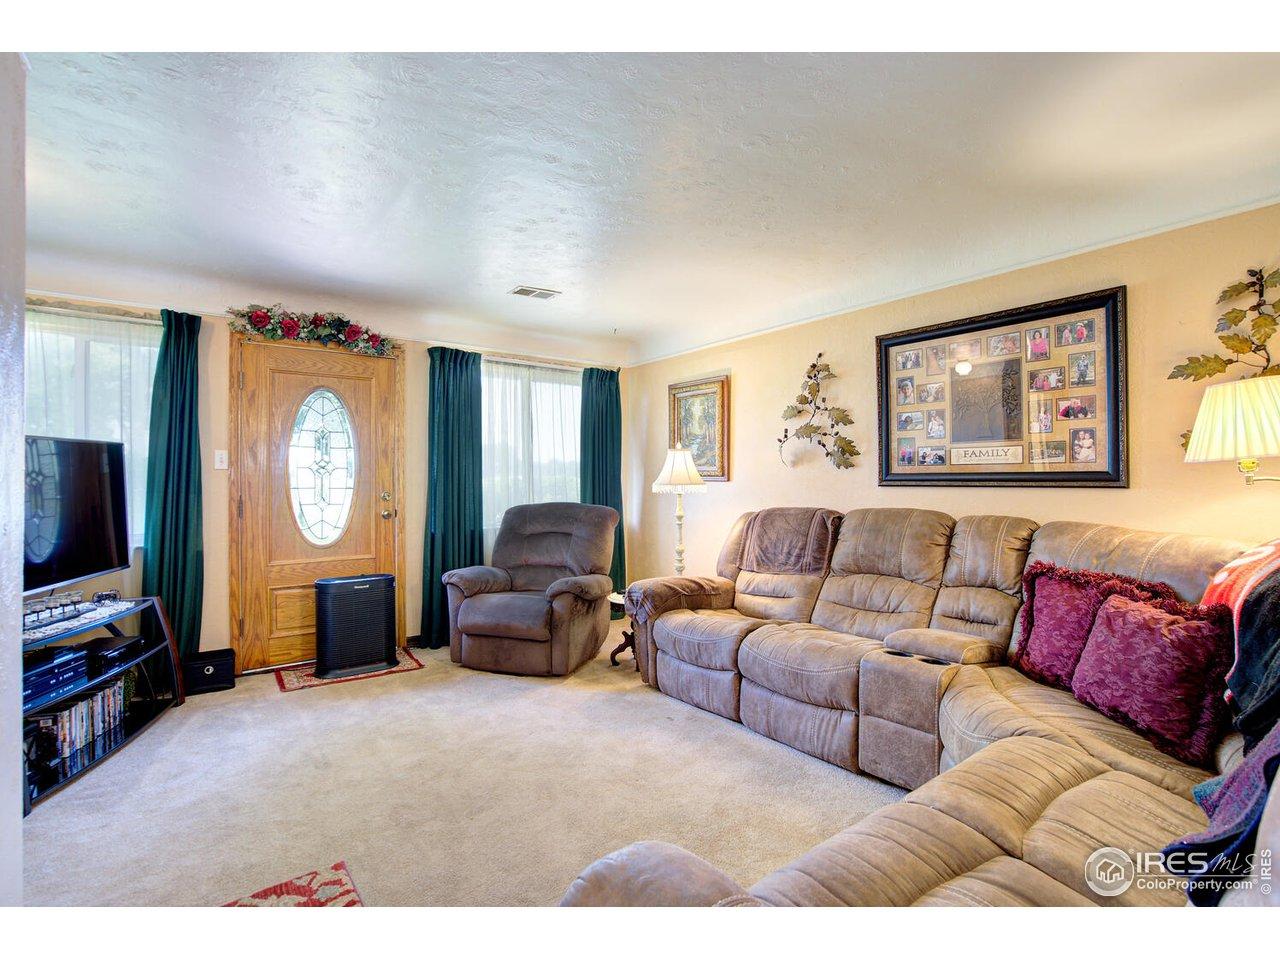 15 x 14 Living Room